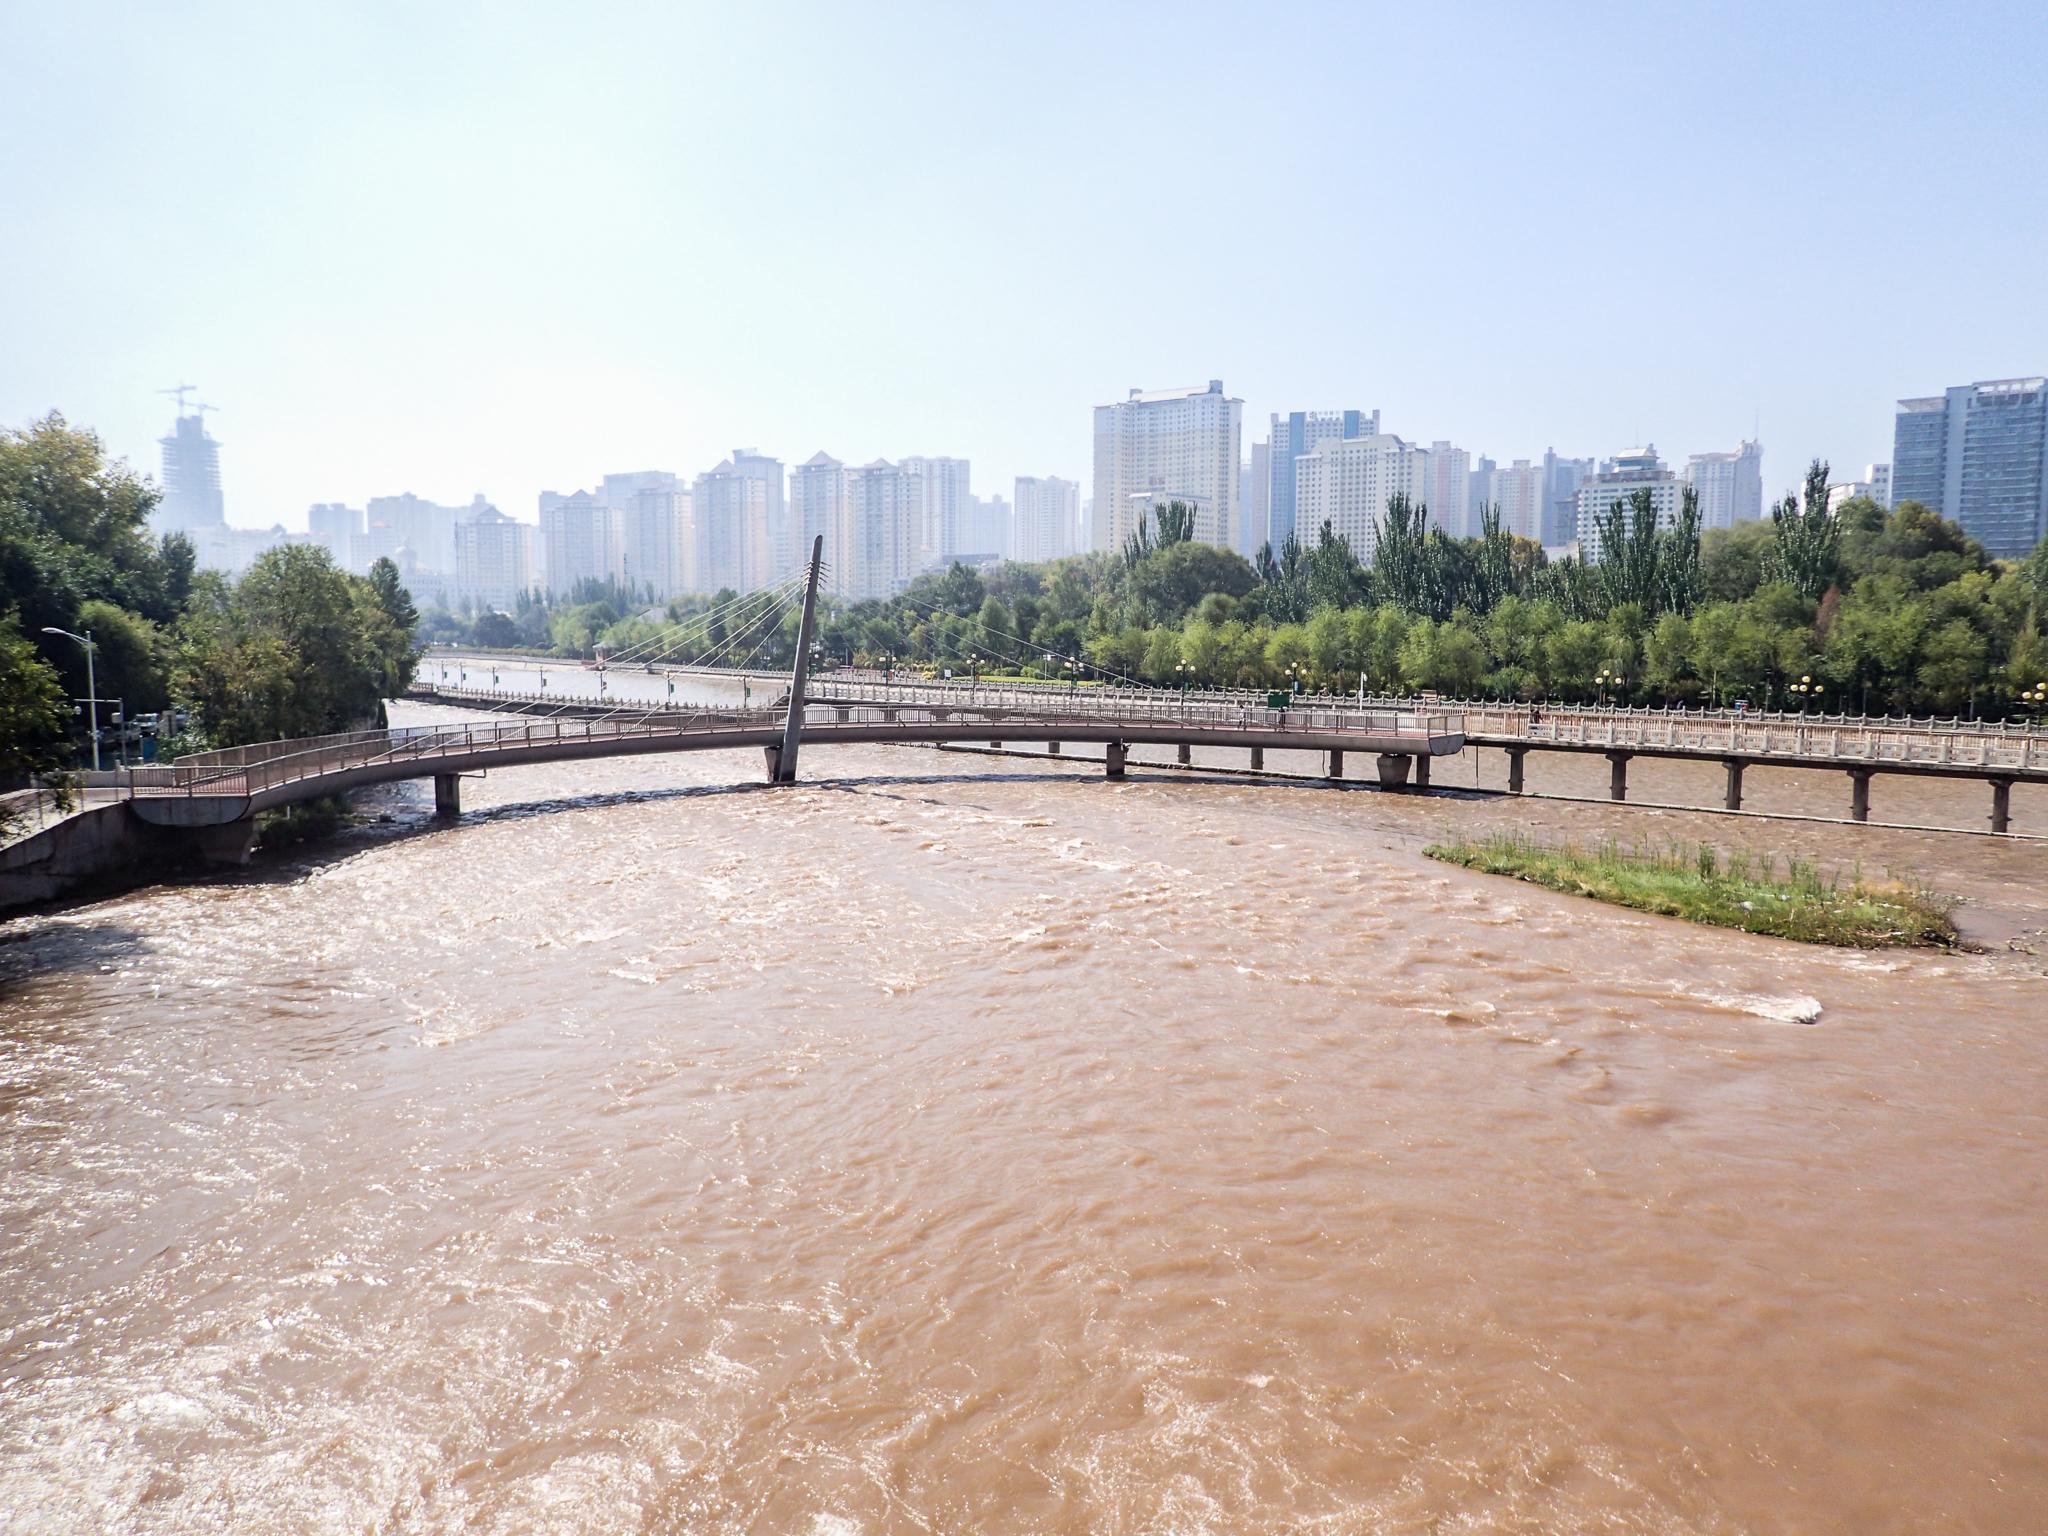 The Huangshui river at Huangyuan